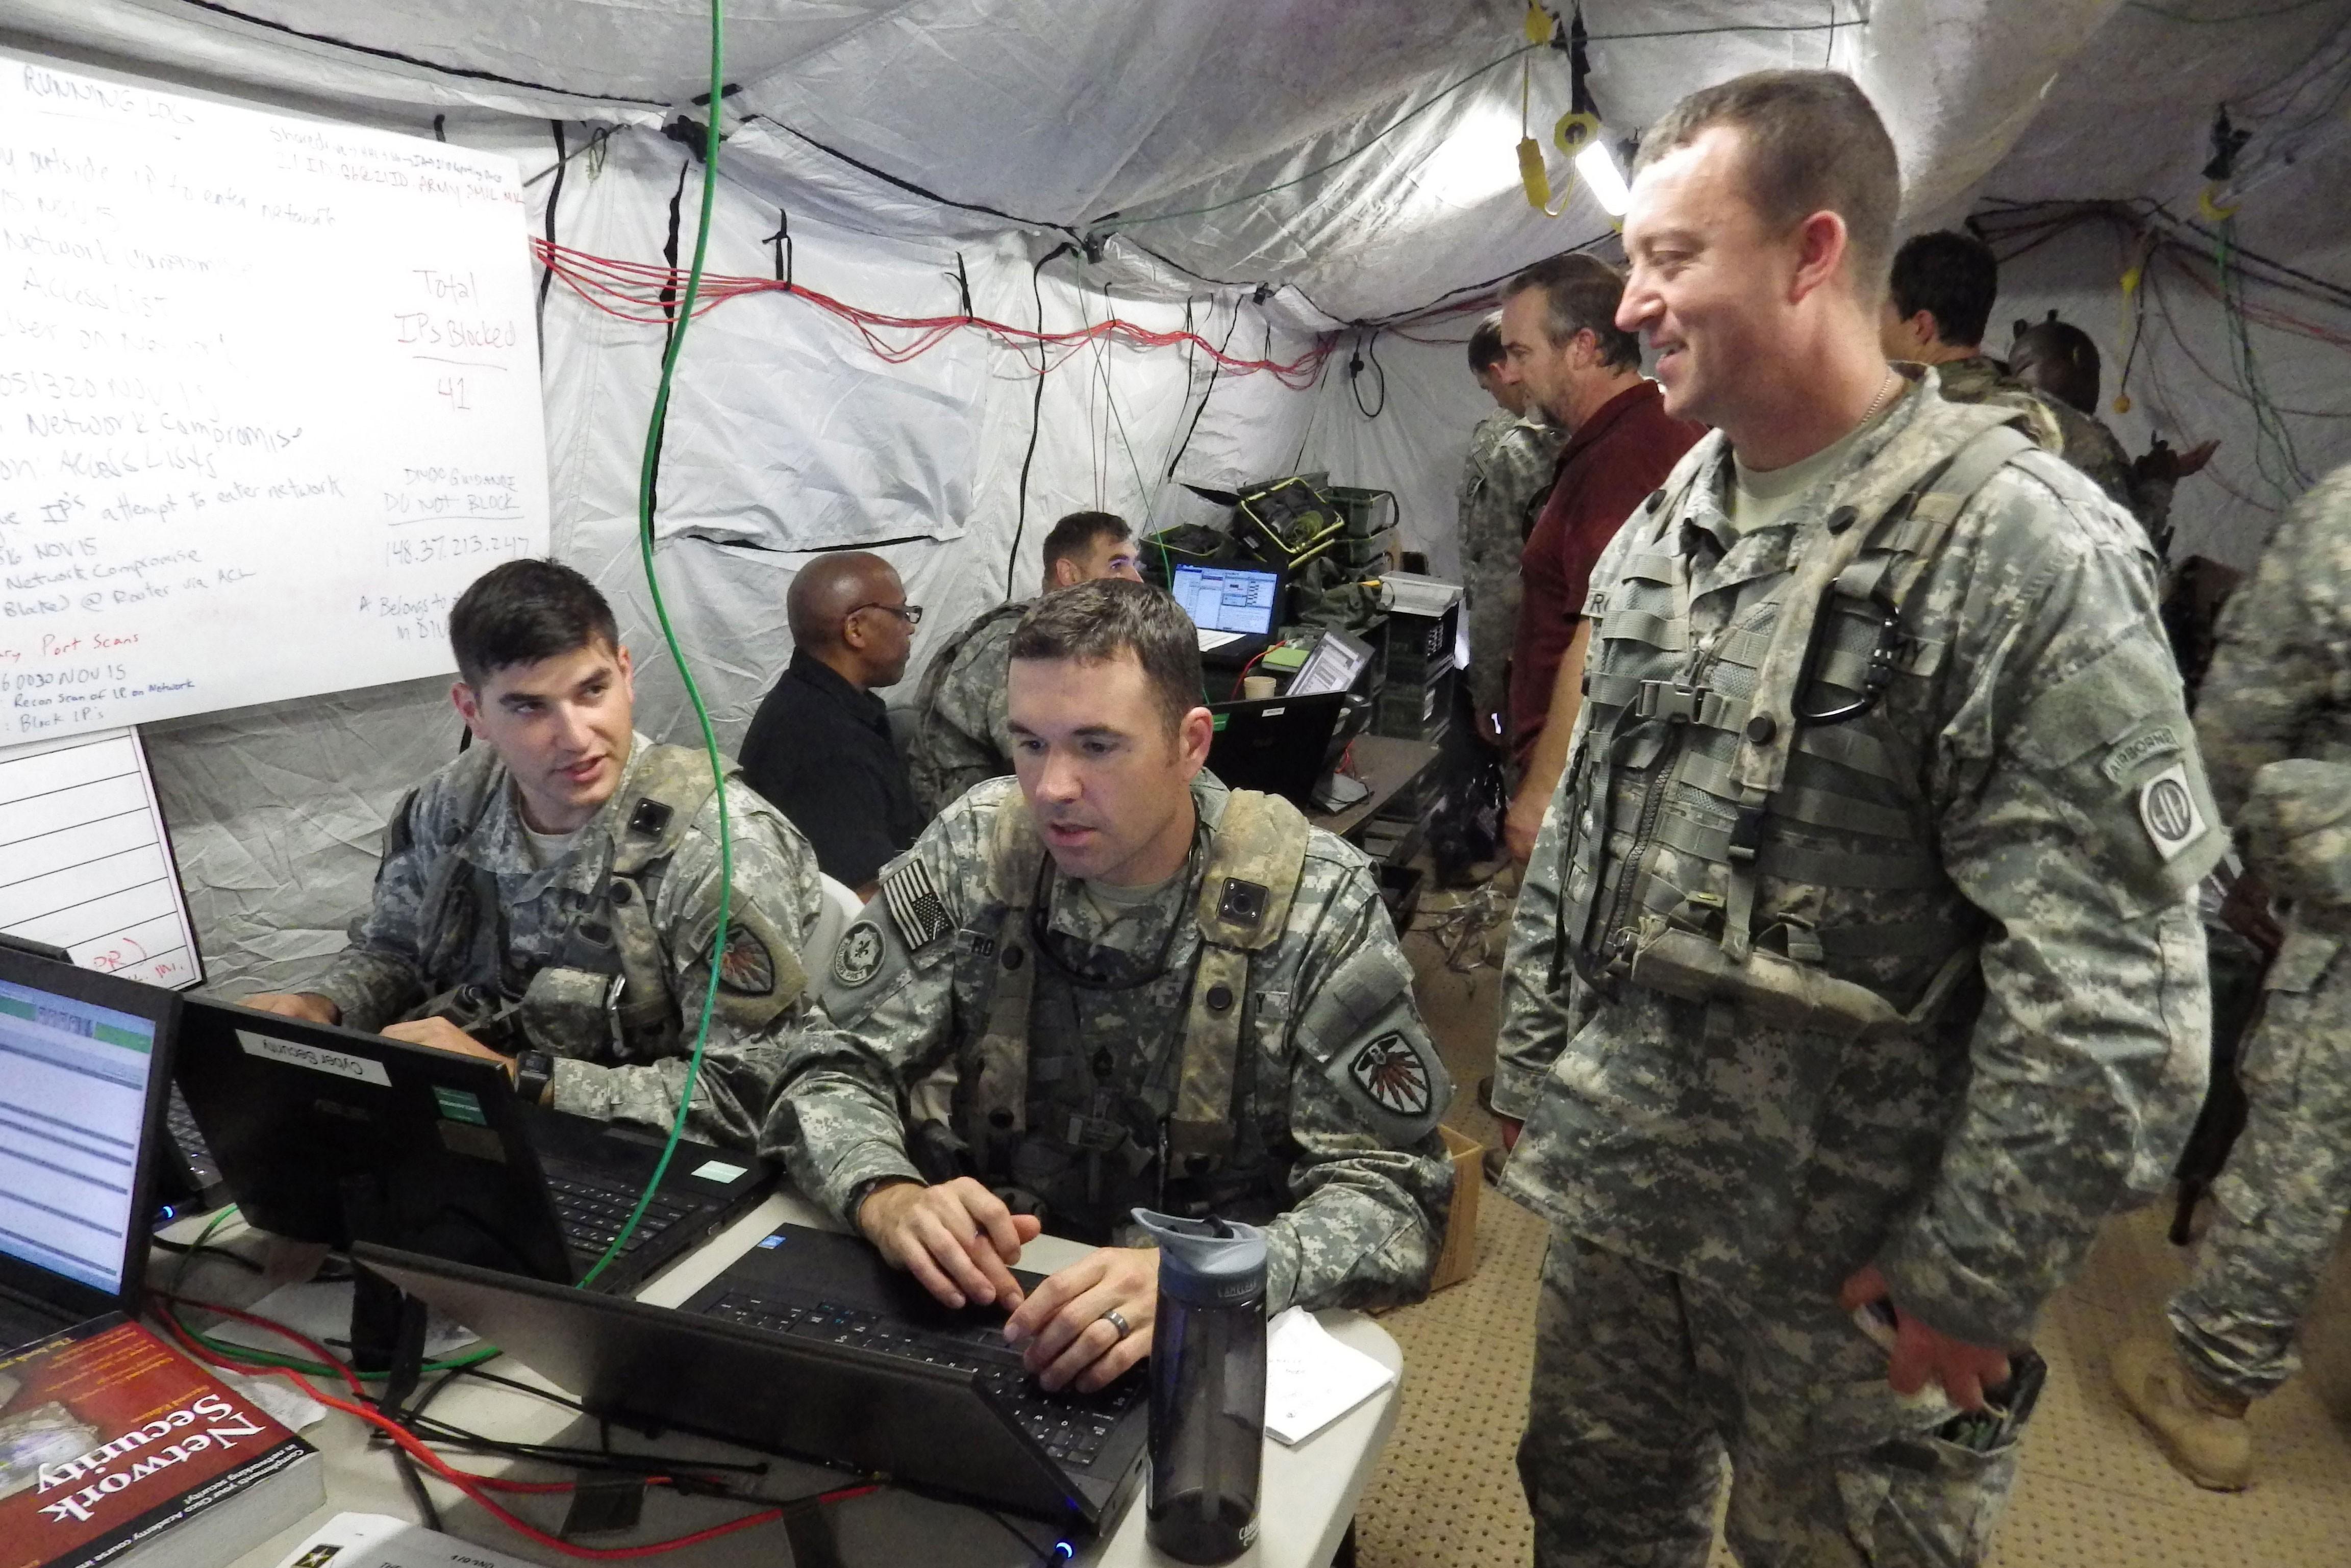 Clockspeed Dilemma Hobbling Army Cyber But Partnerships